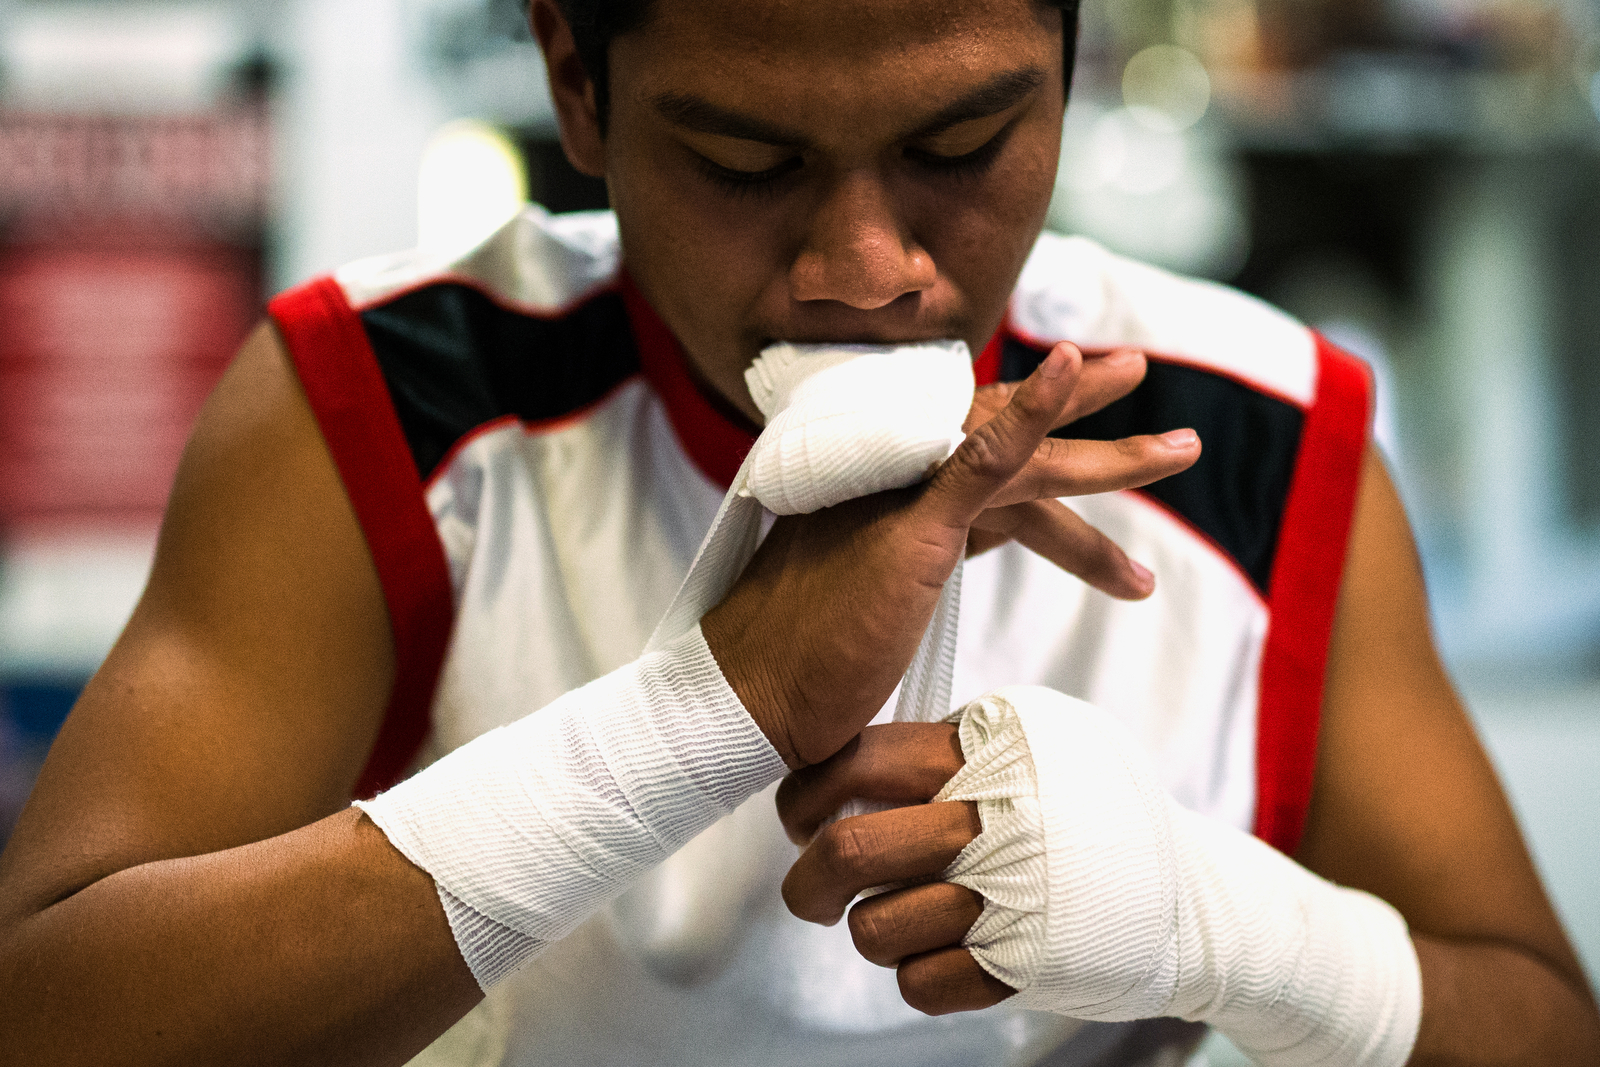 George Rico prepares for his workout at La Habra Boxing Club on November 6, 2015 in La Habra, California.